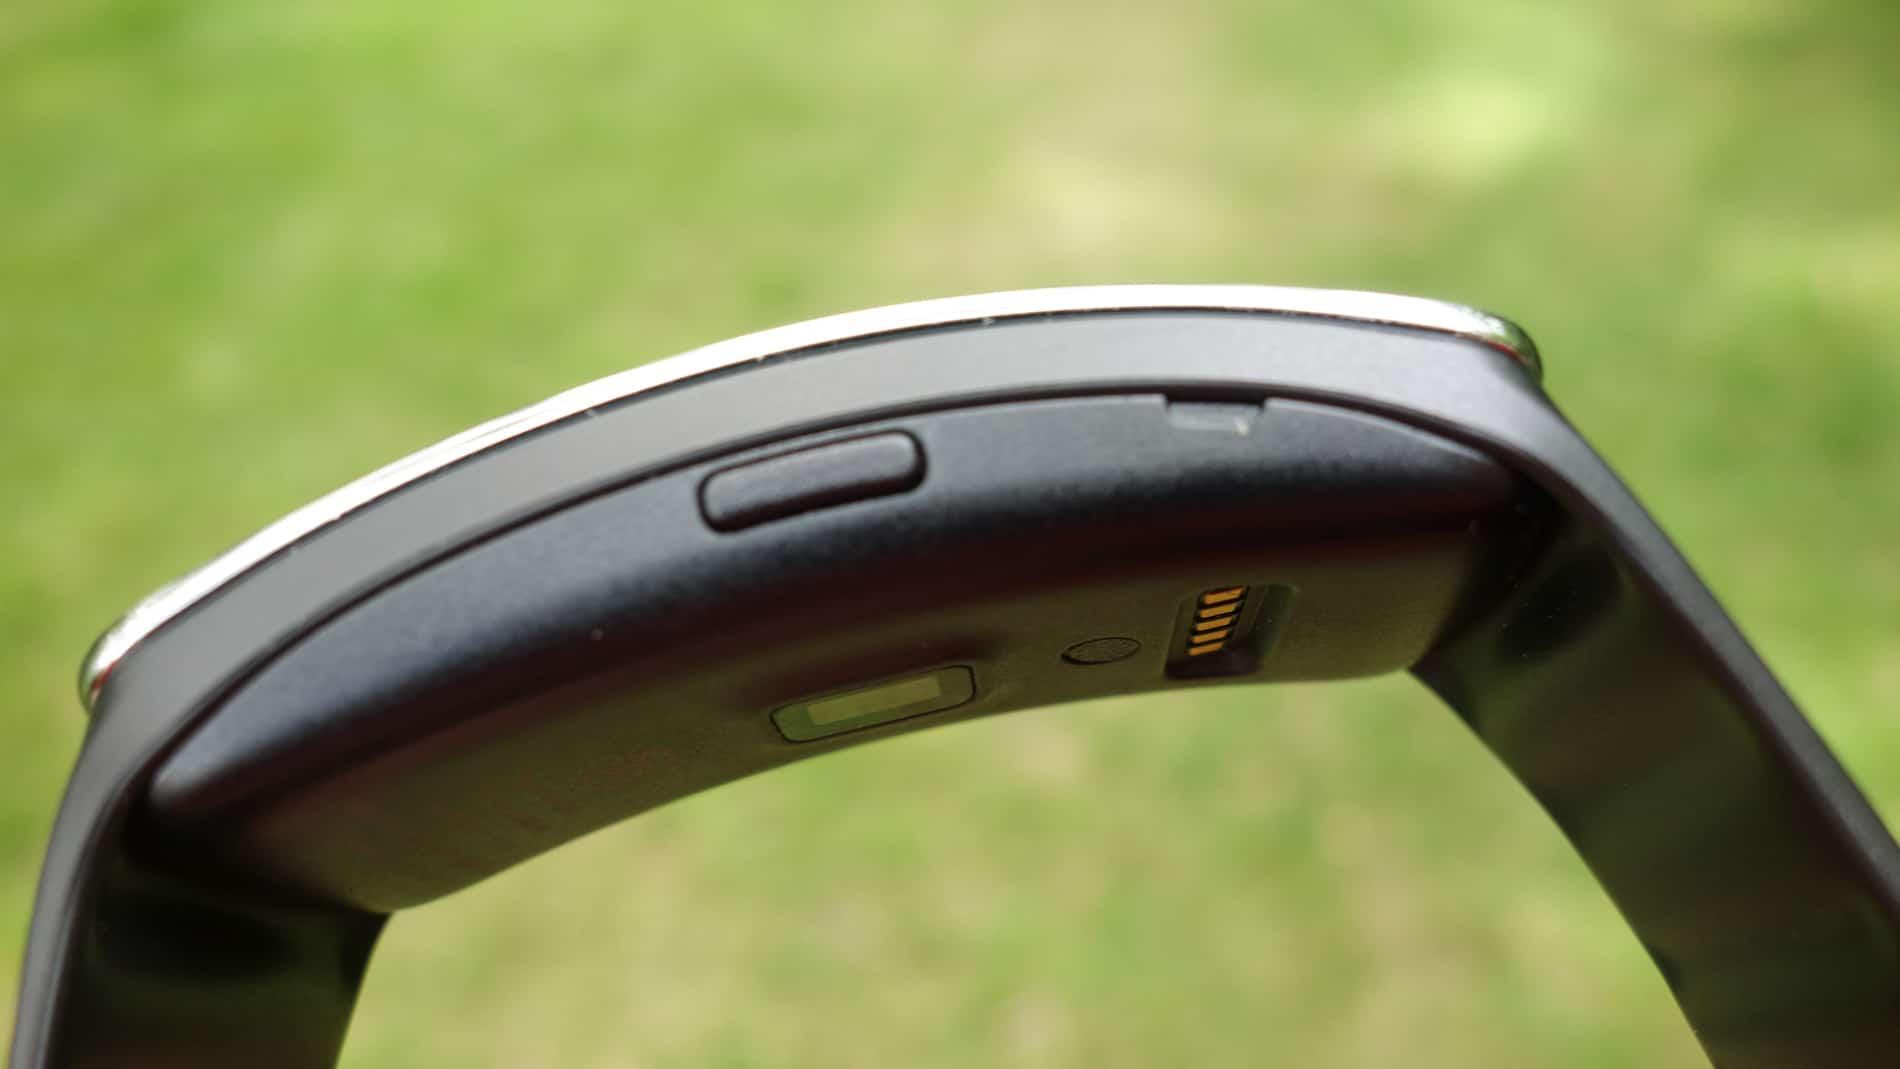 Samsung-Gear-Fit-AH-9